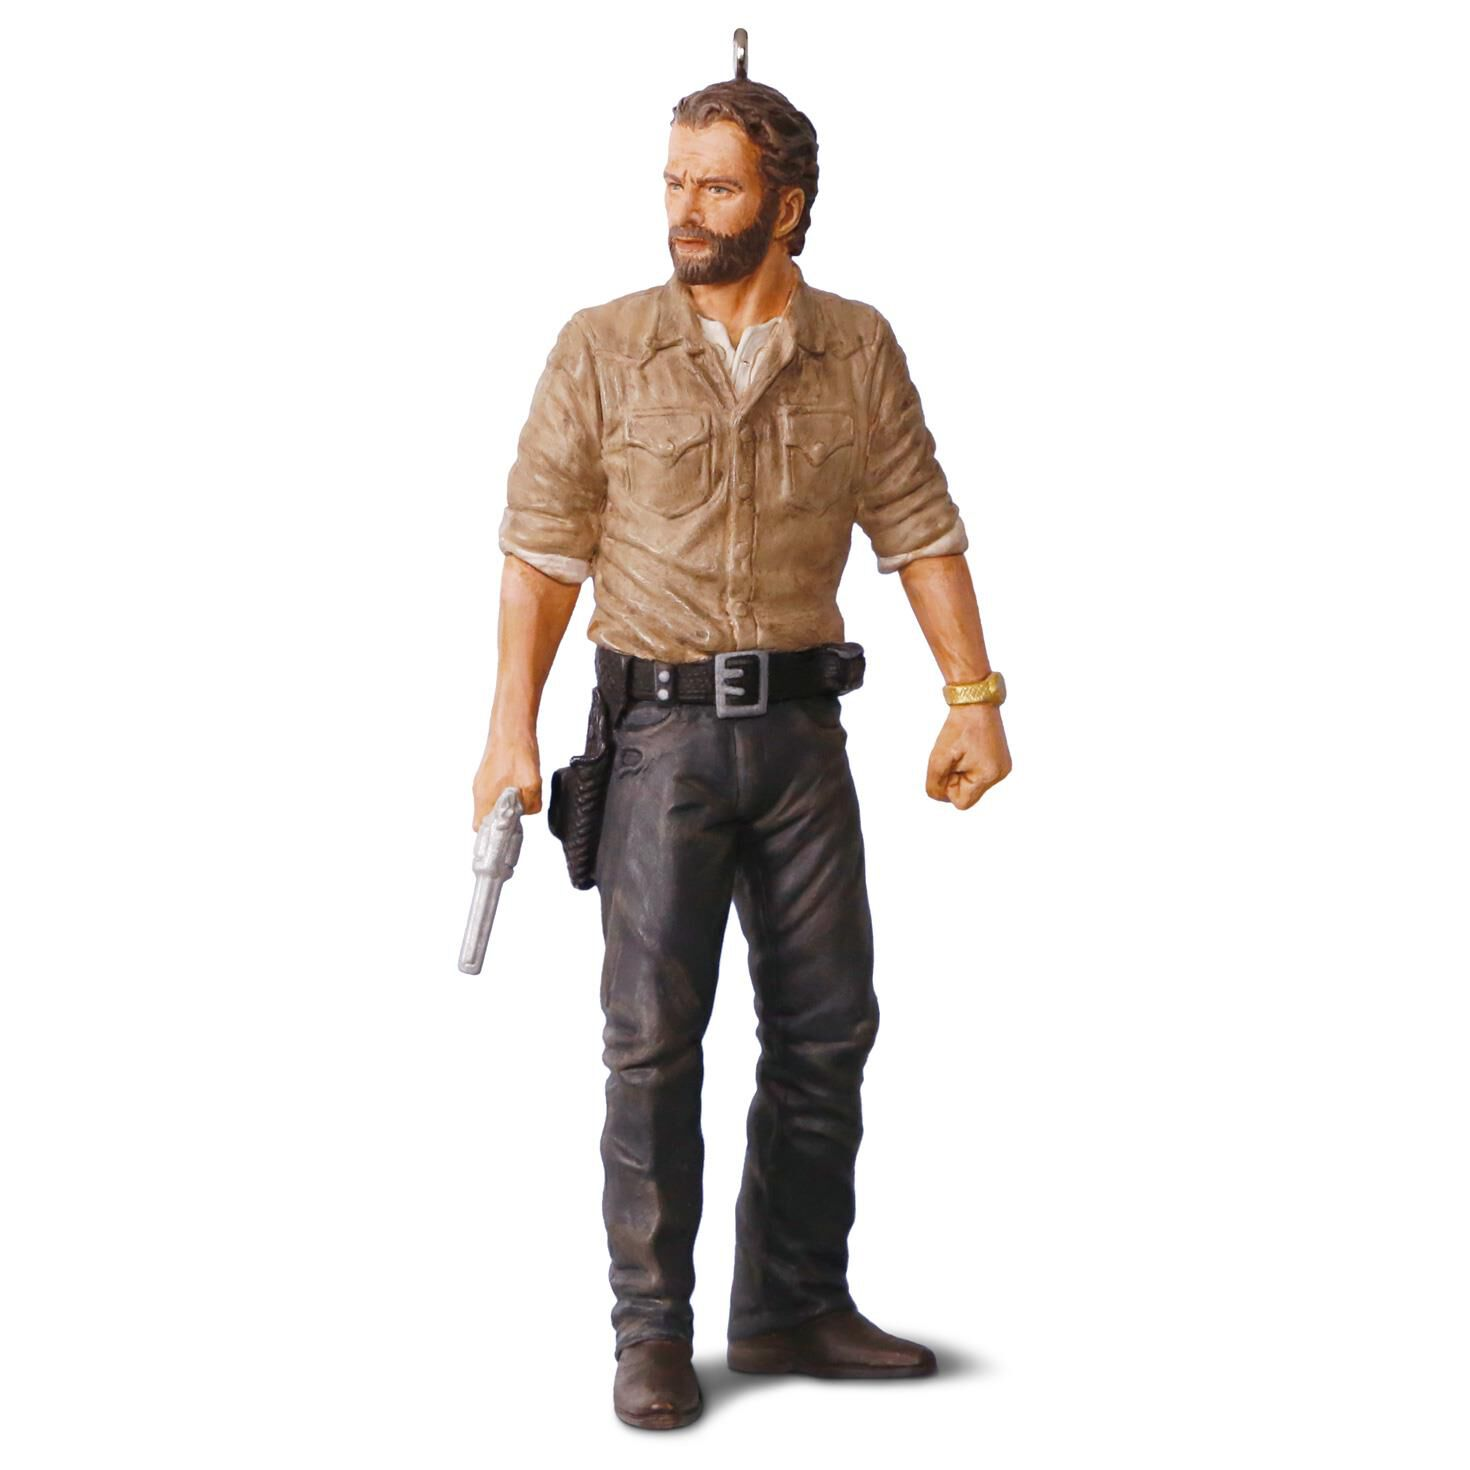 AMC The Walking Dead Rick Grimes Ornament - Keepsake Ornaments ...